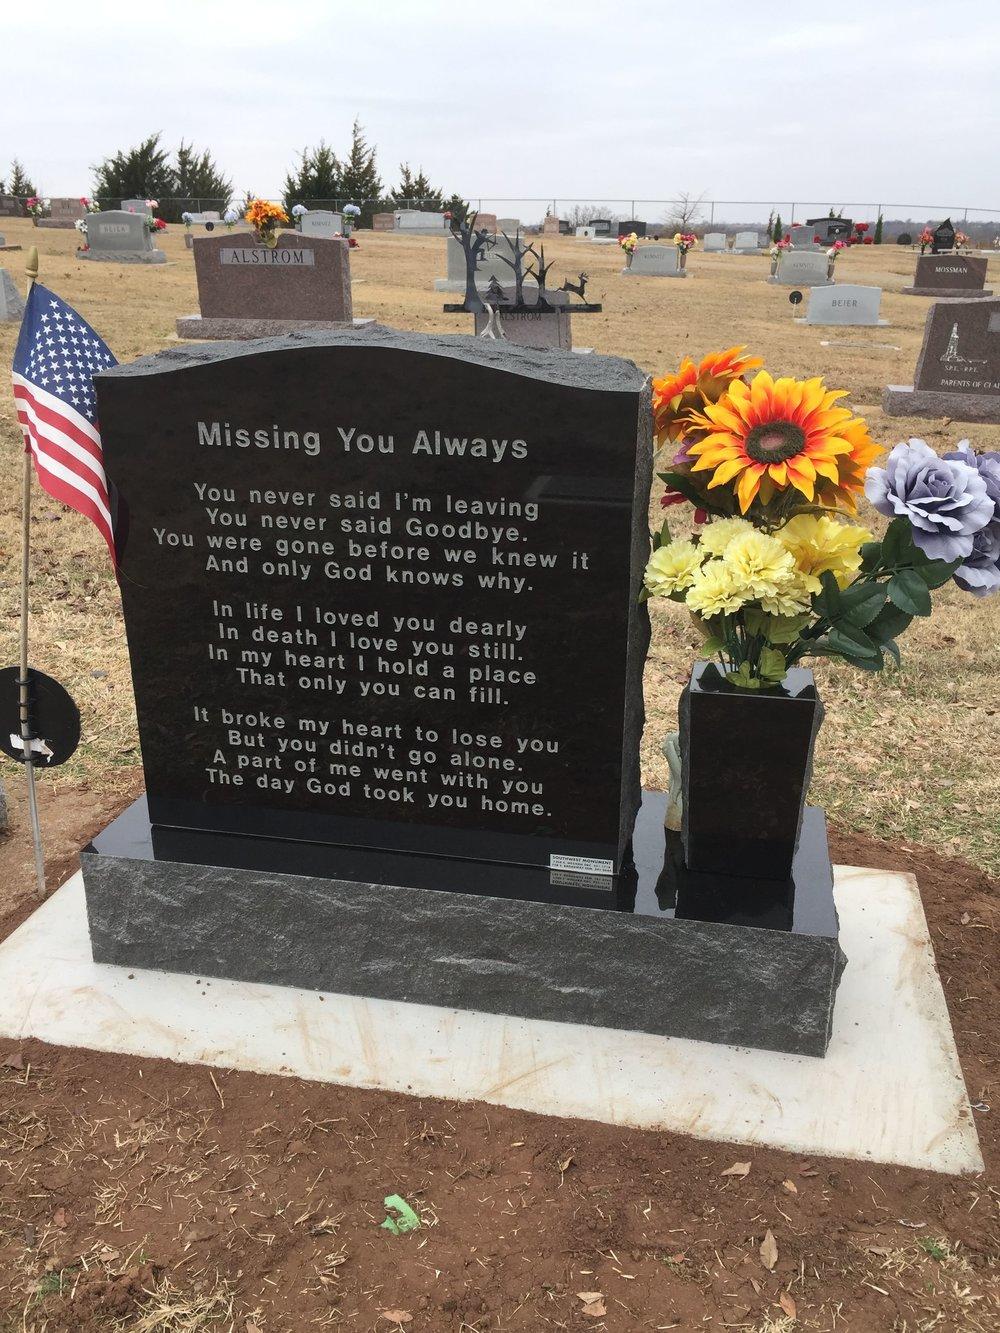 40. Gracehill Cemetery, Perry, OK